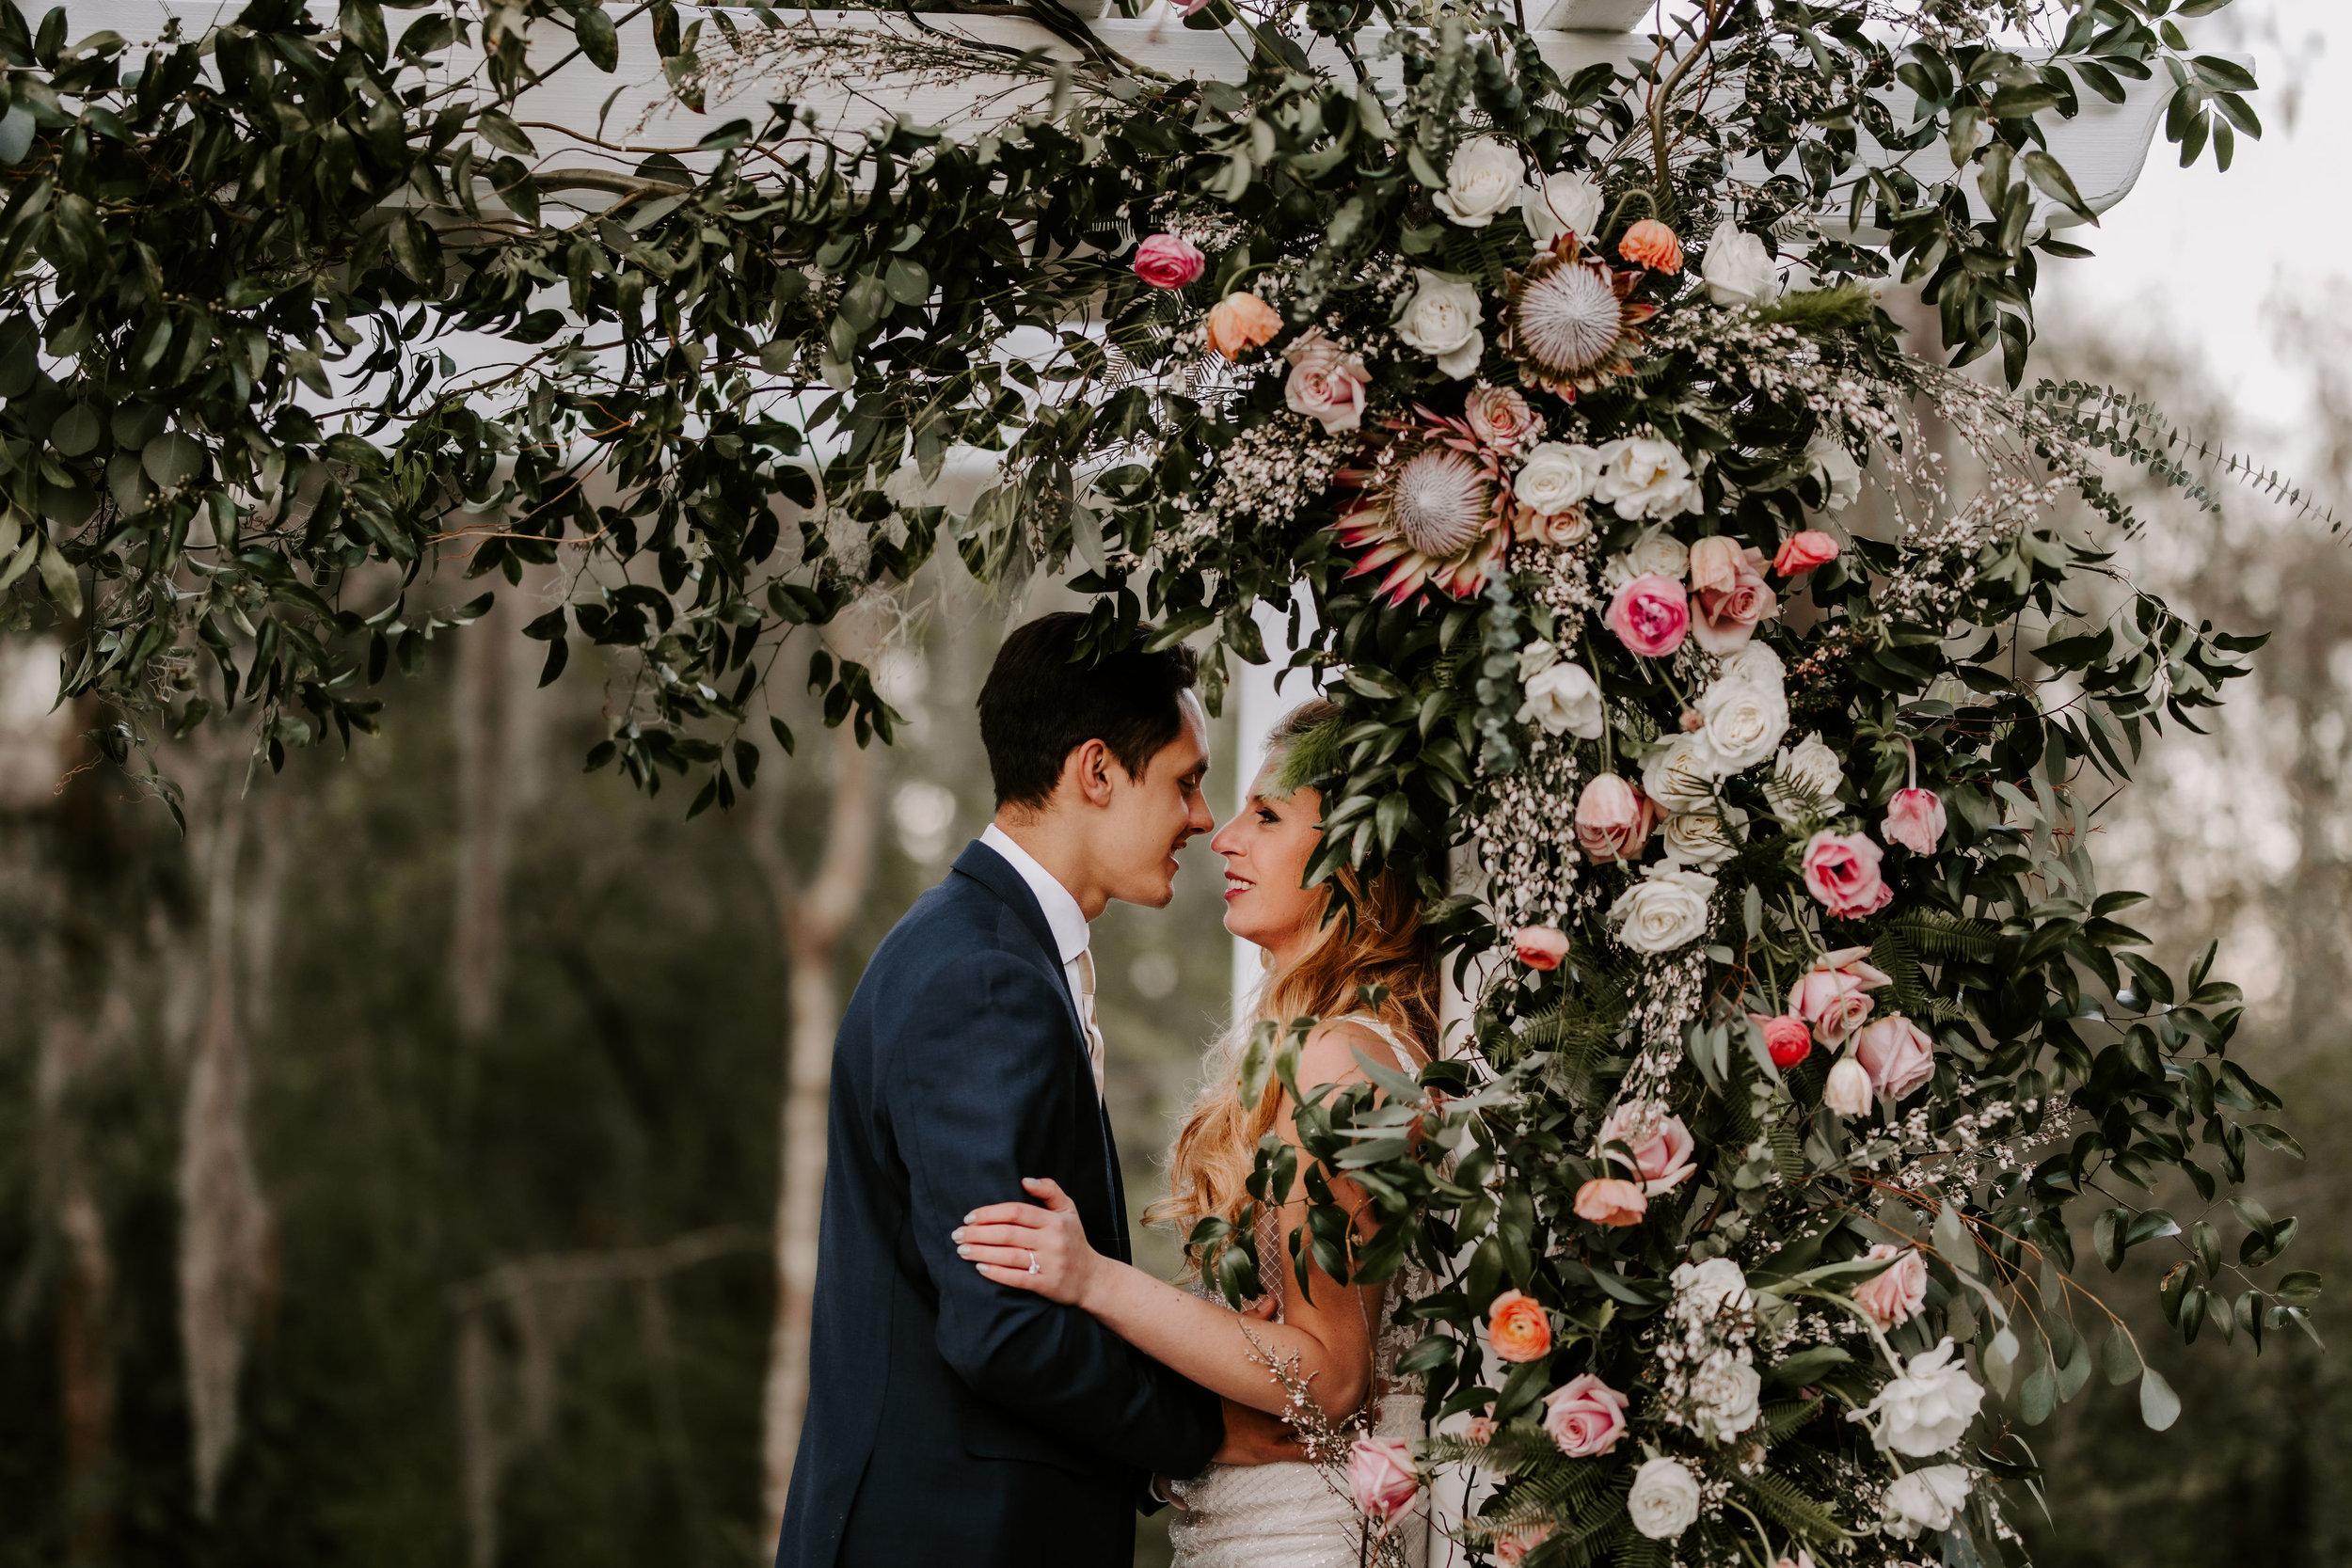 ivory-and-beau-blog-mackey-house-styled-shoot-savannah-wedding-bridal-boutique-savannah-florist-southern-wedding-_G5A2865.jpg